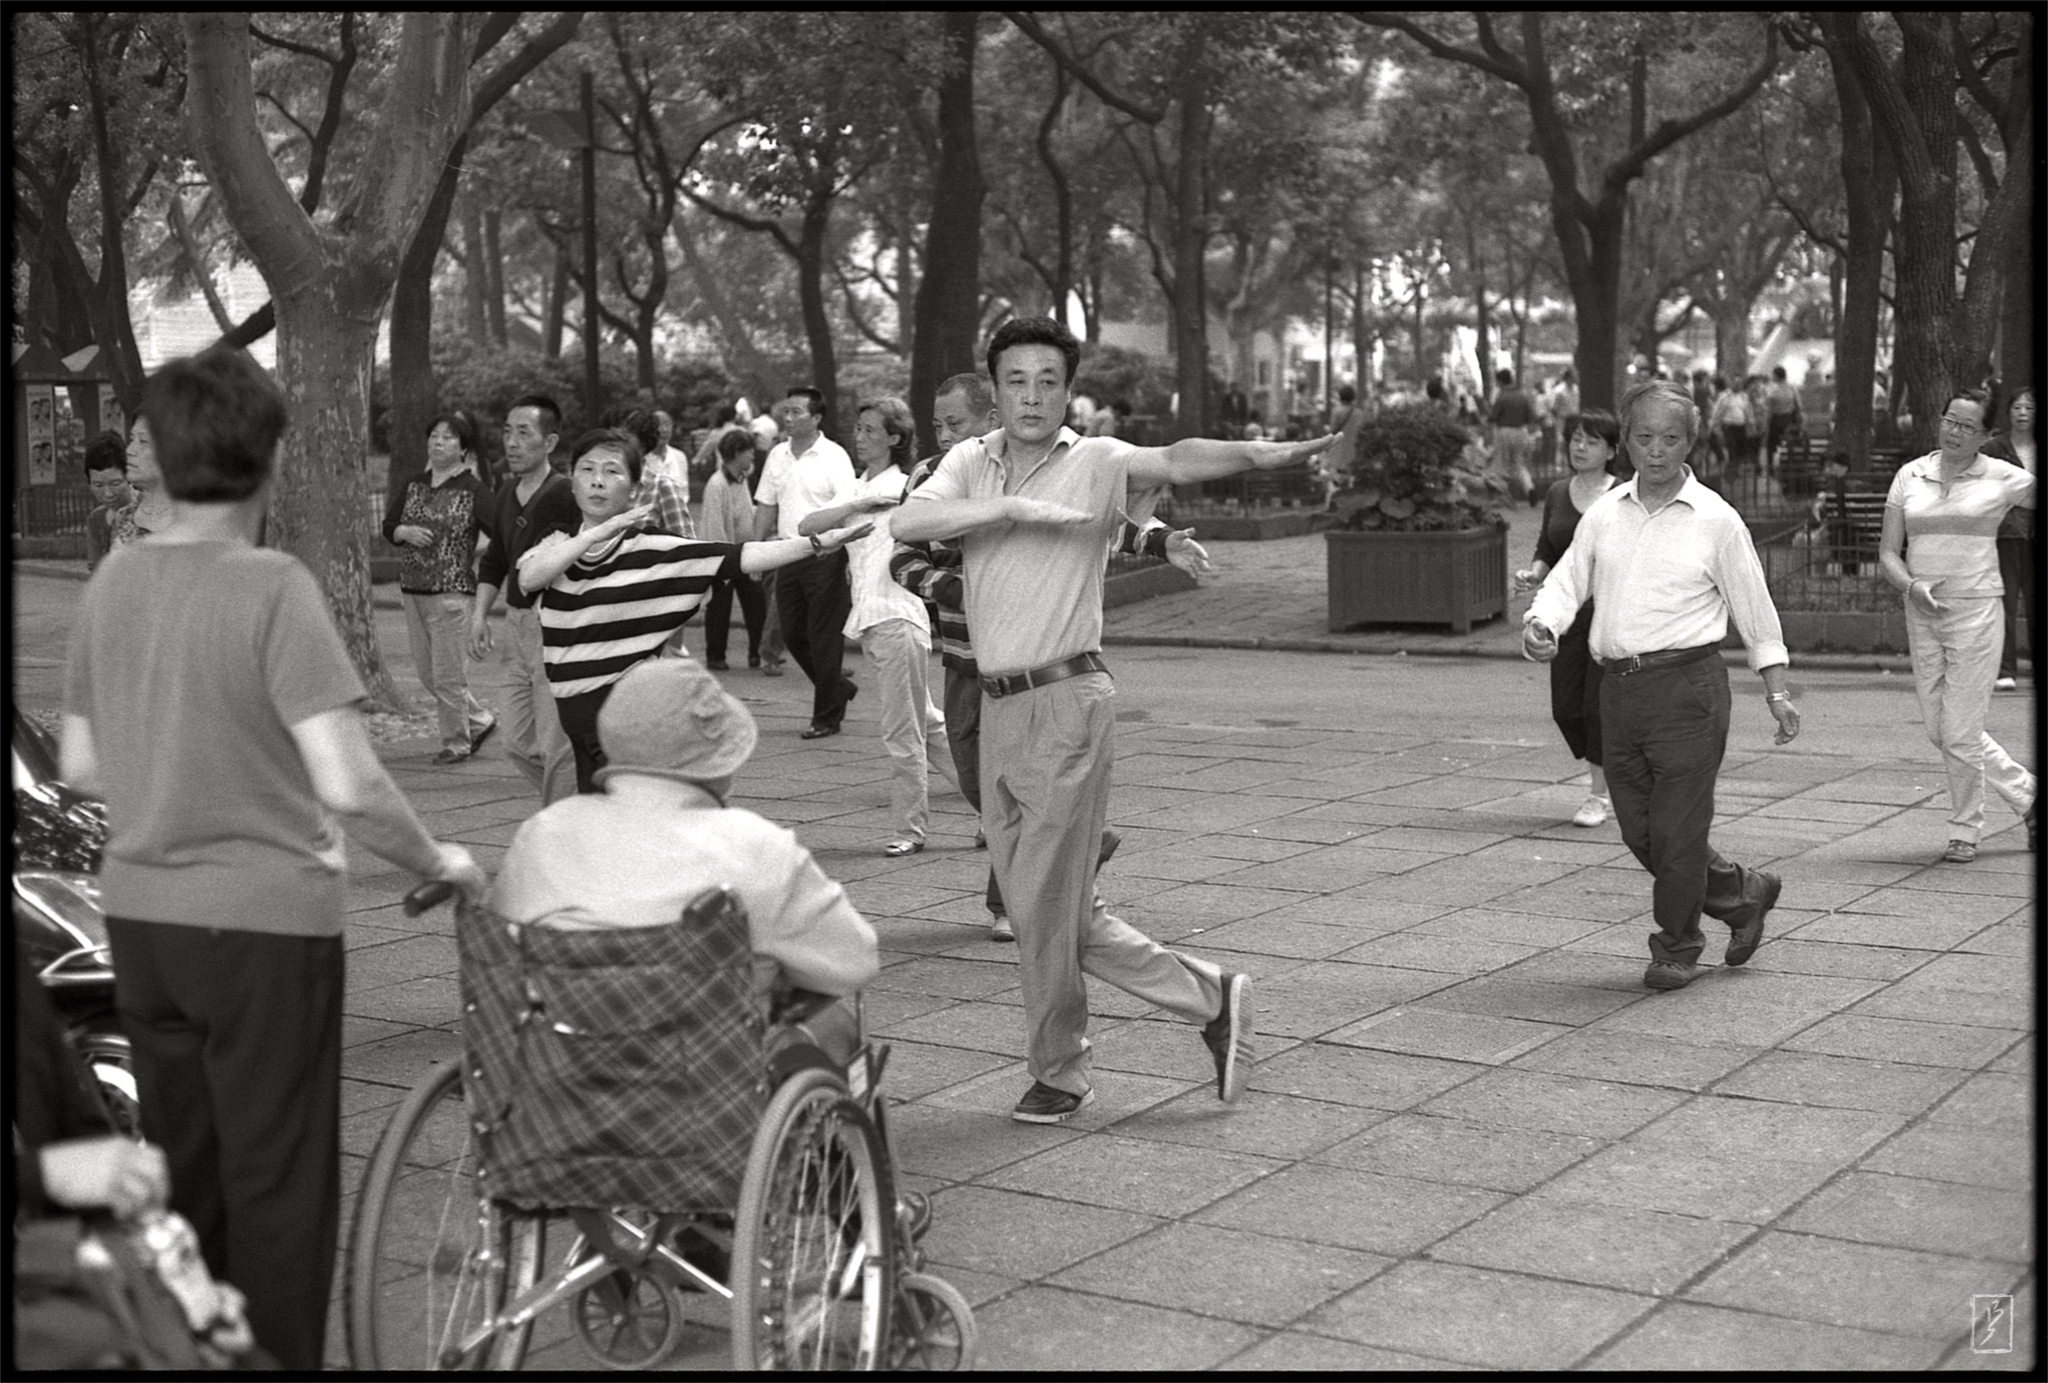 Lu Xun park (鲁迅公园): Line dance.